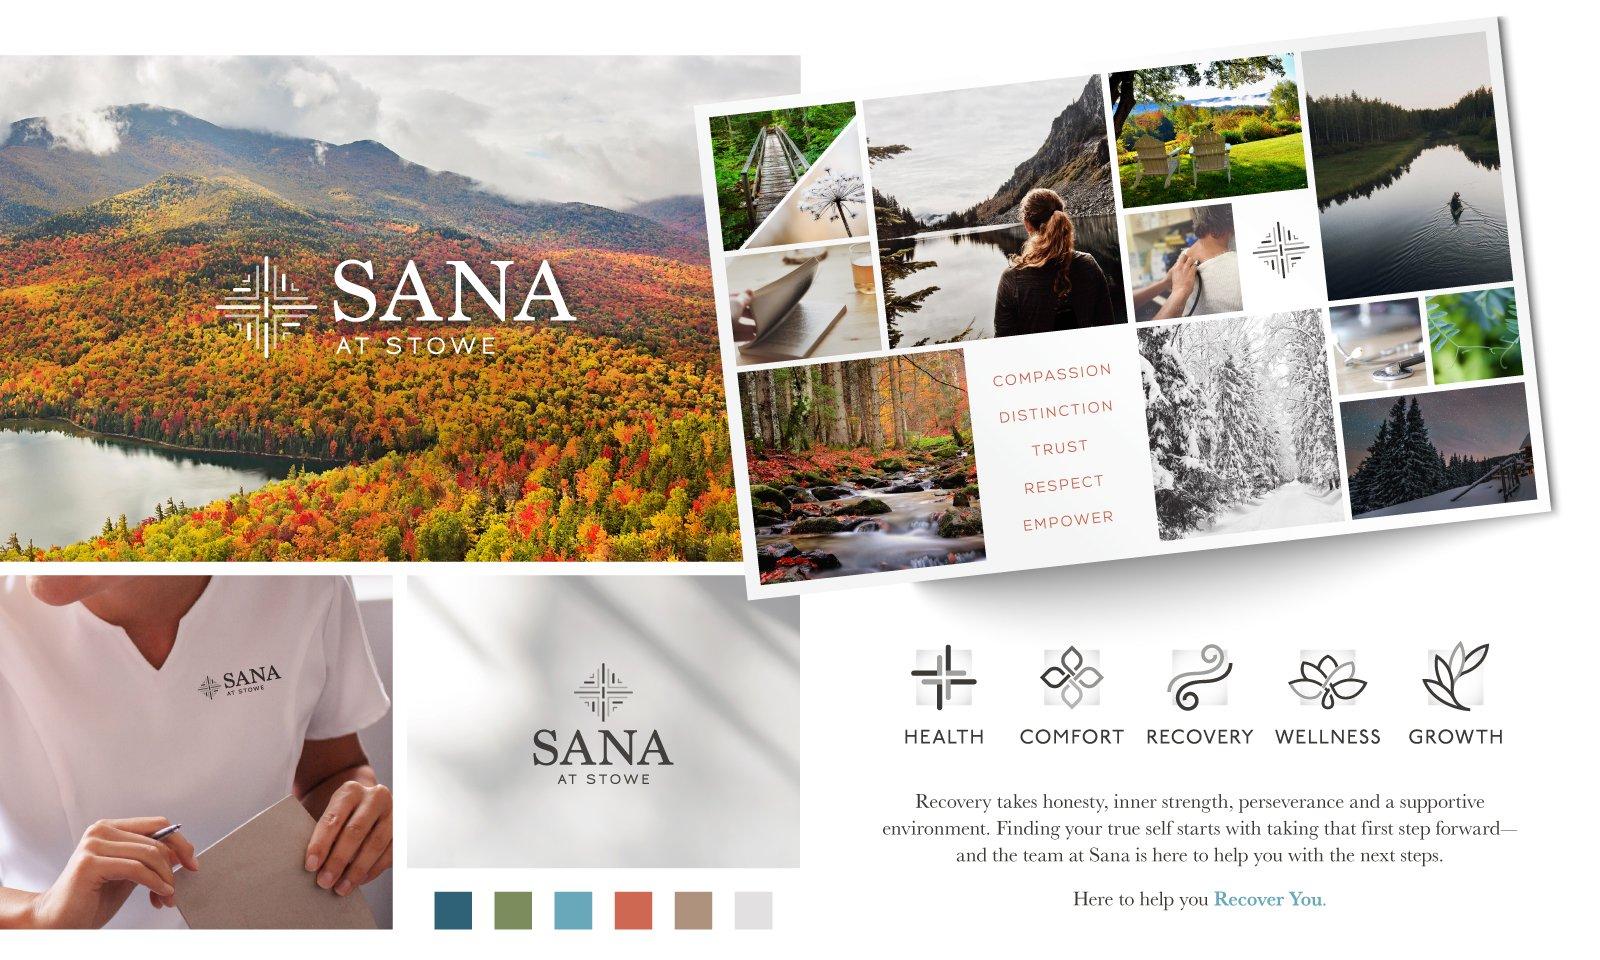 Sana at Stowe Brand Development